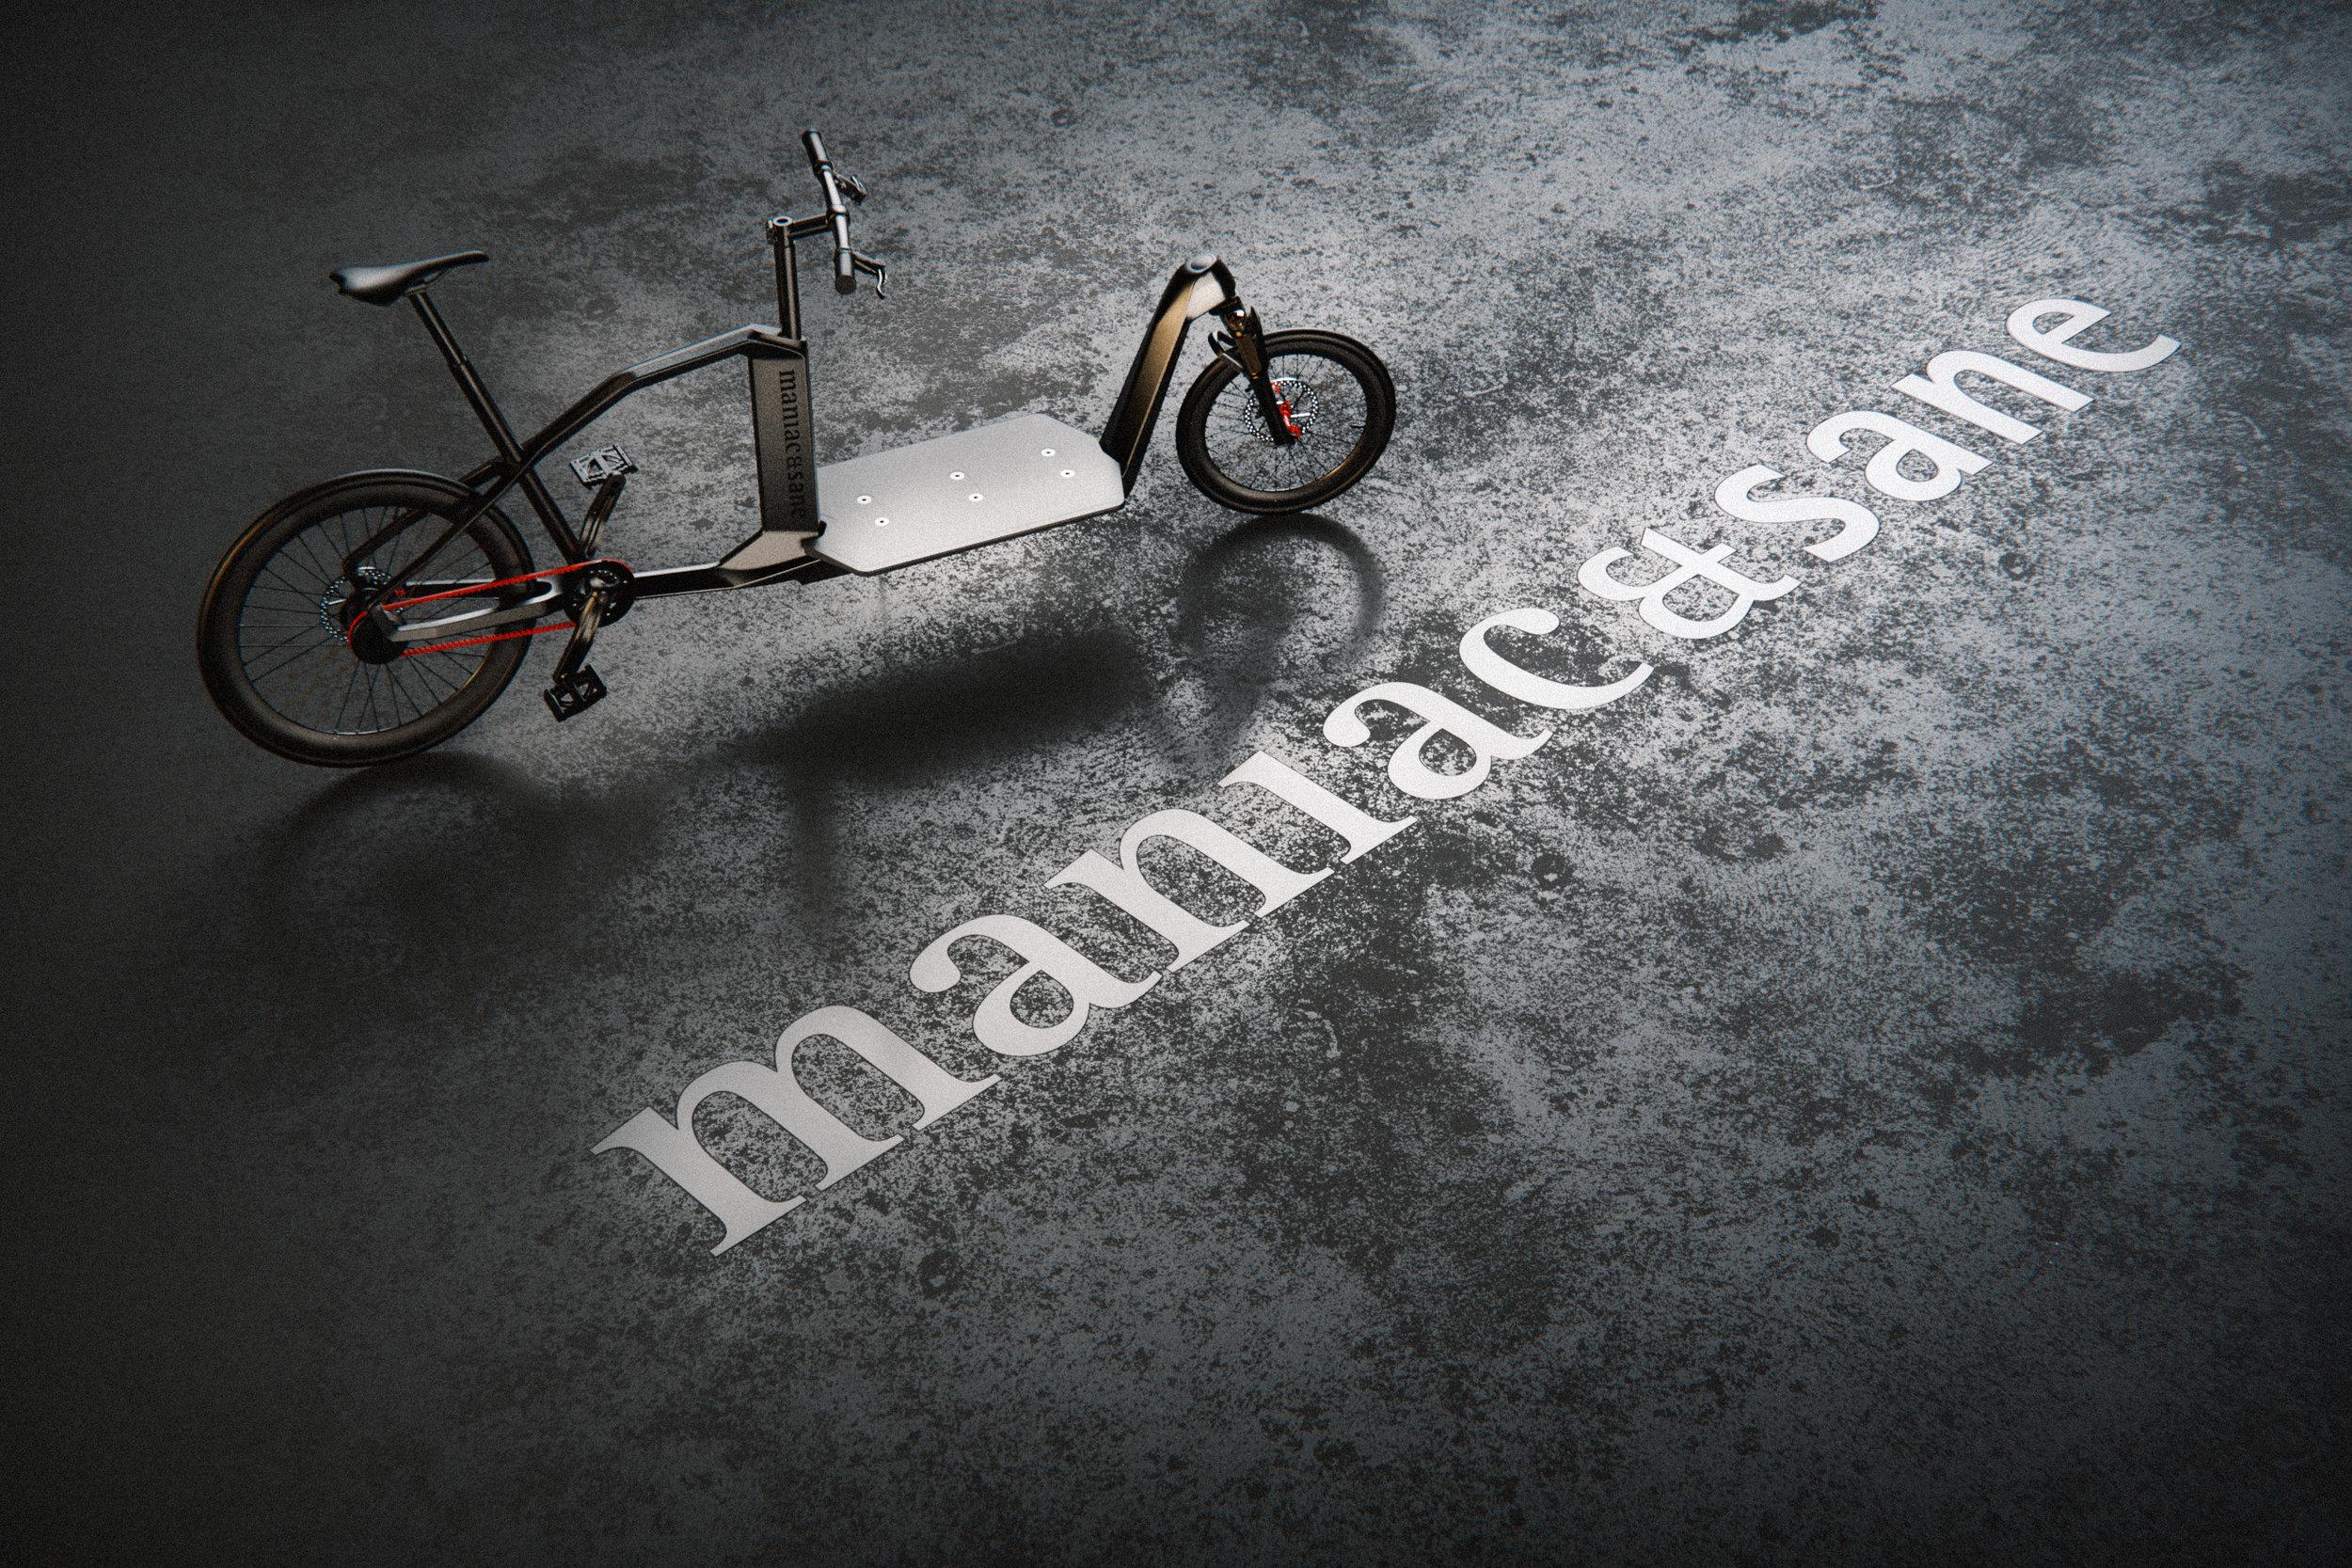 maniacandsane-render-02.31.jpg